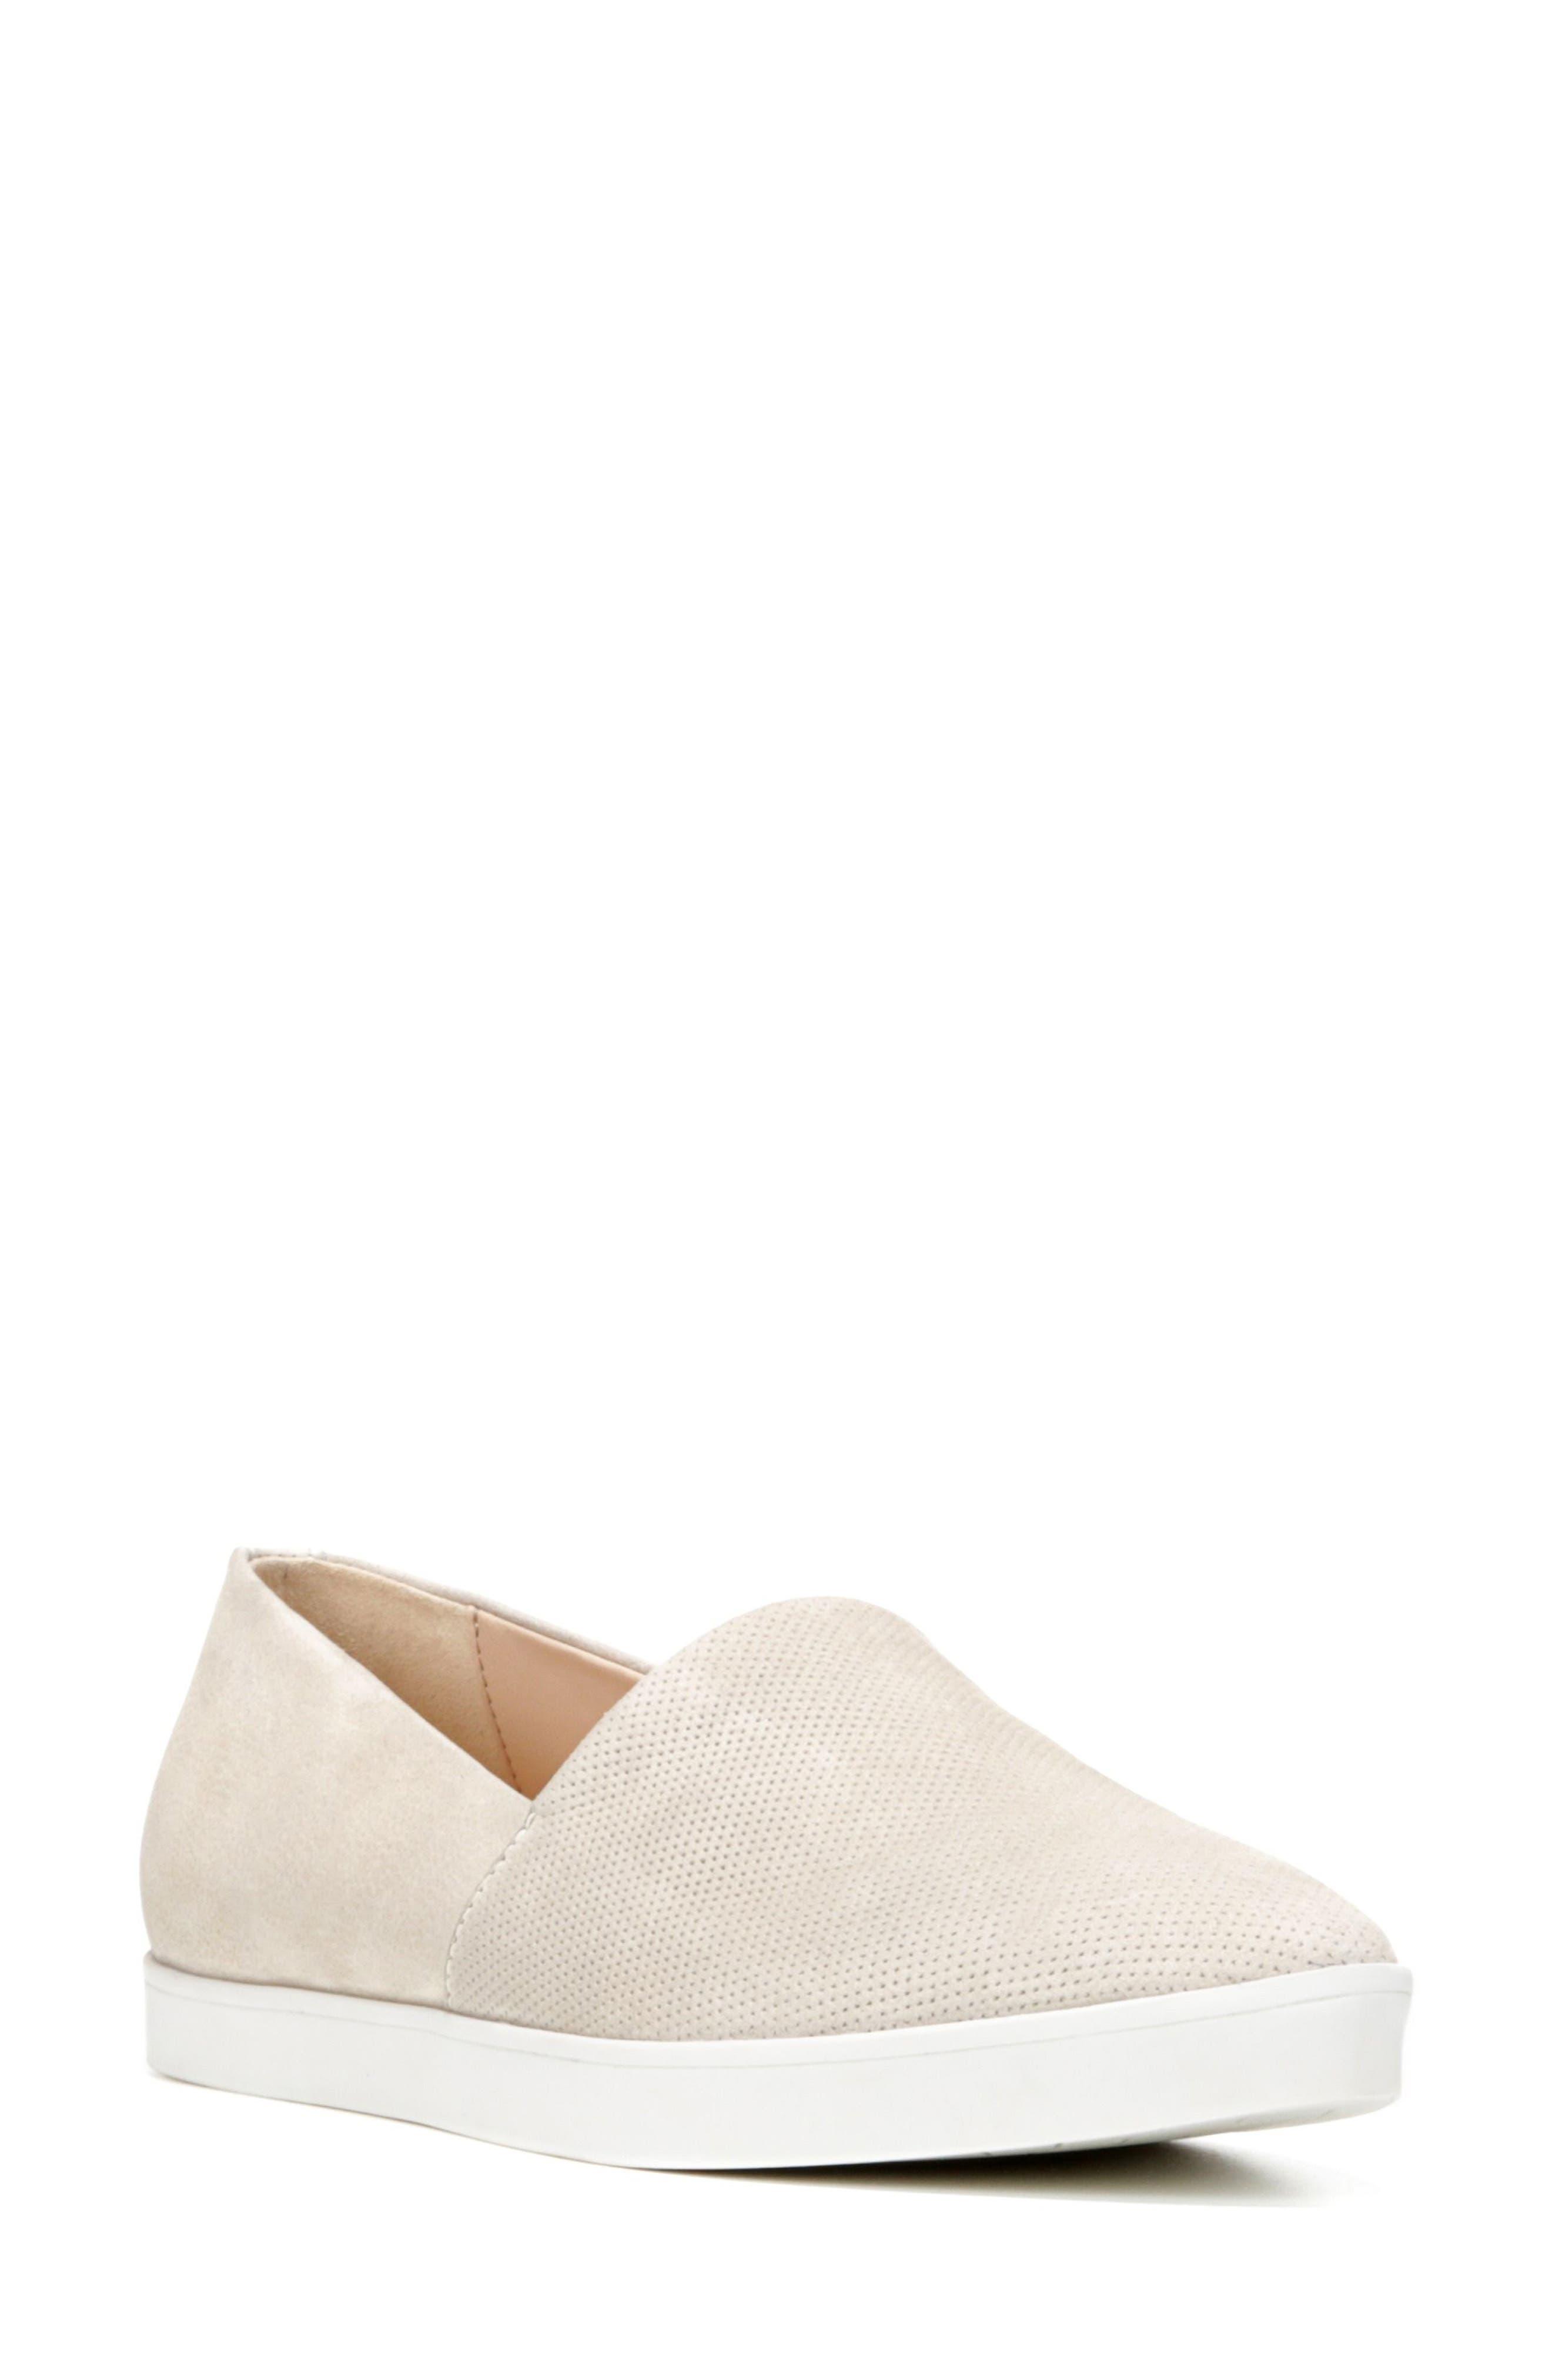 Alternate Image 1 Selected - Dr. Scholl's 'Vienna' Slip-on Sneaker (Women)